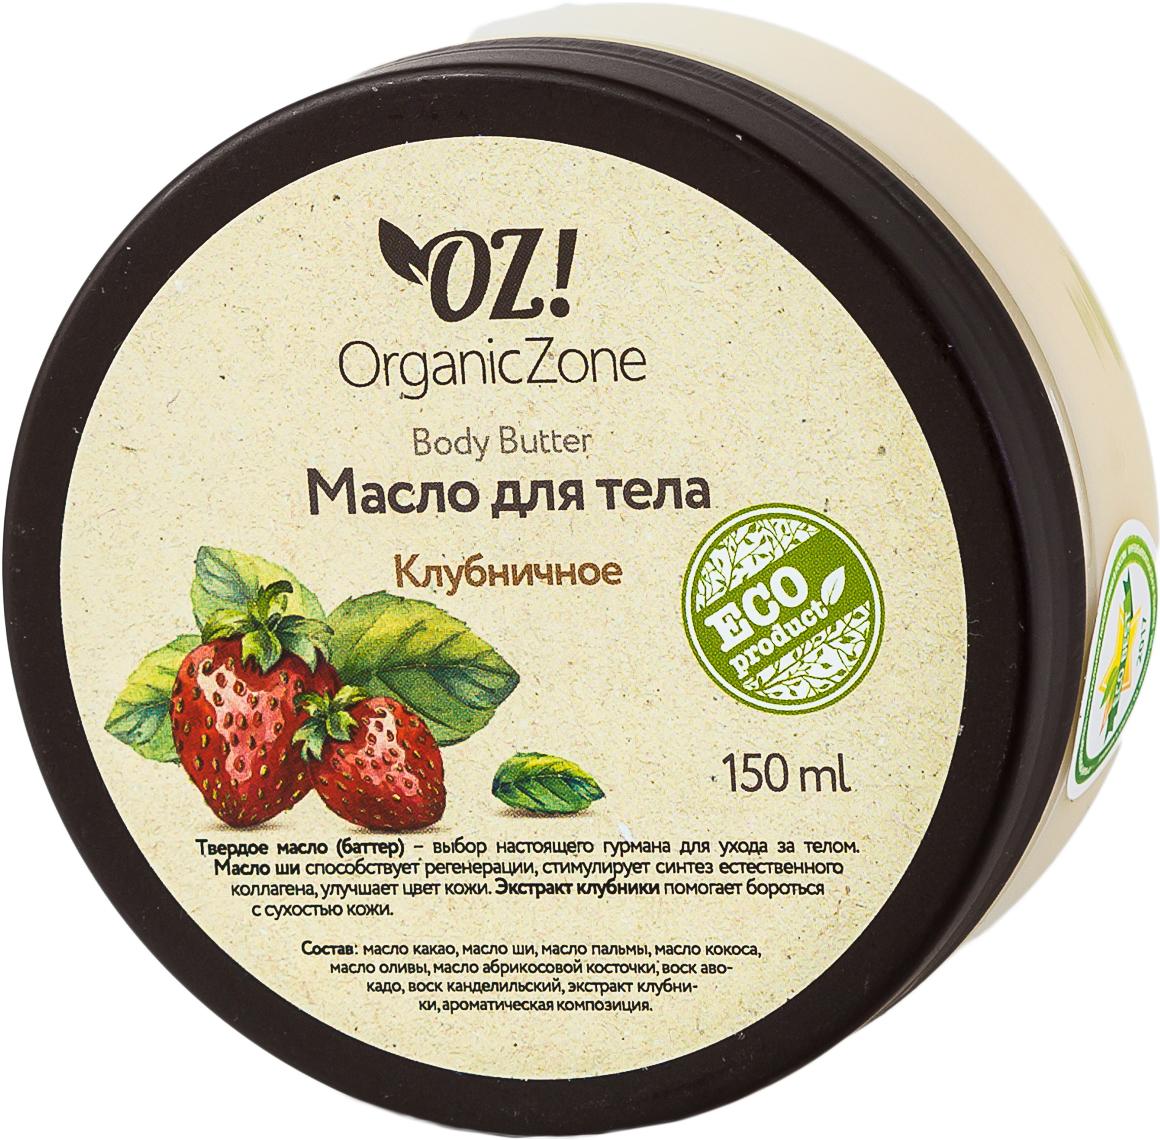 OrganicZone Баттер для тела Клубничный, 150 мл бальзам для волос oz organiczone oz organiczone oz001lwcowj2